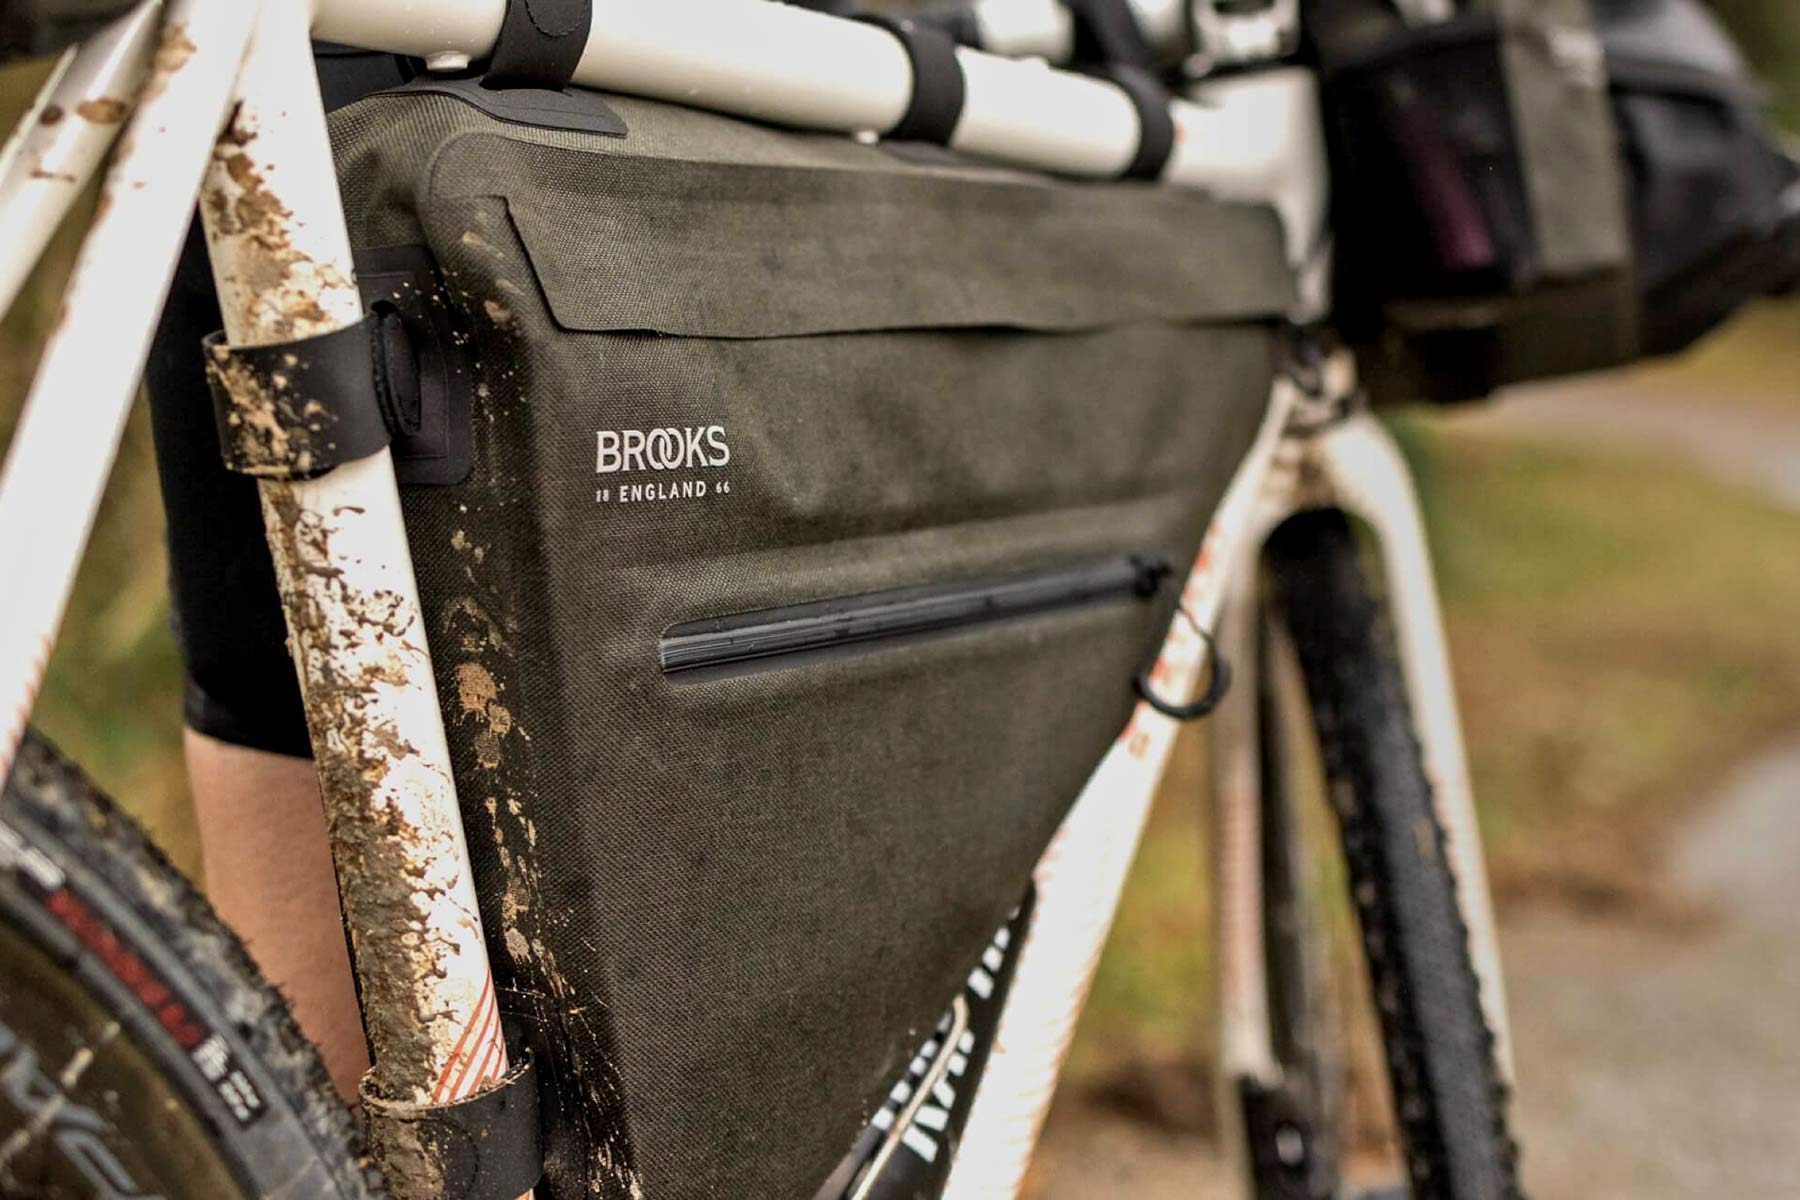 Brooks England Scape bikepacking bike touring packs